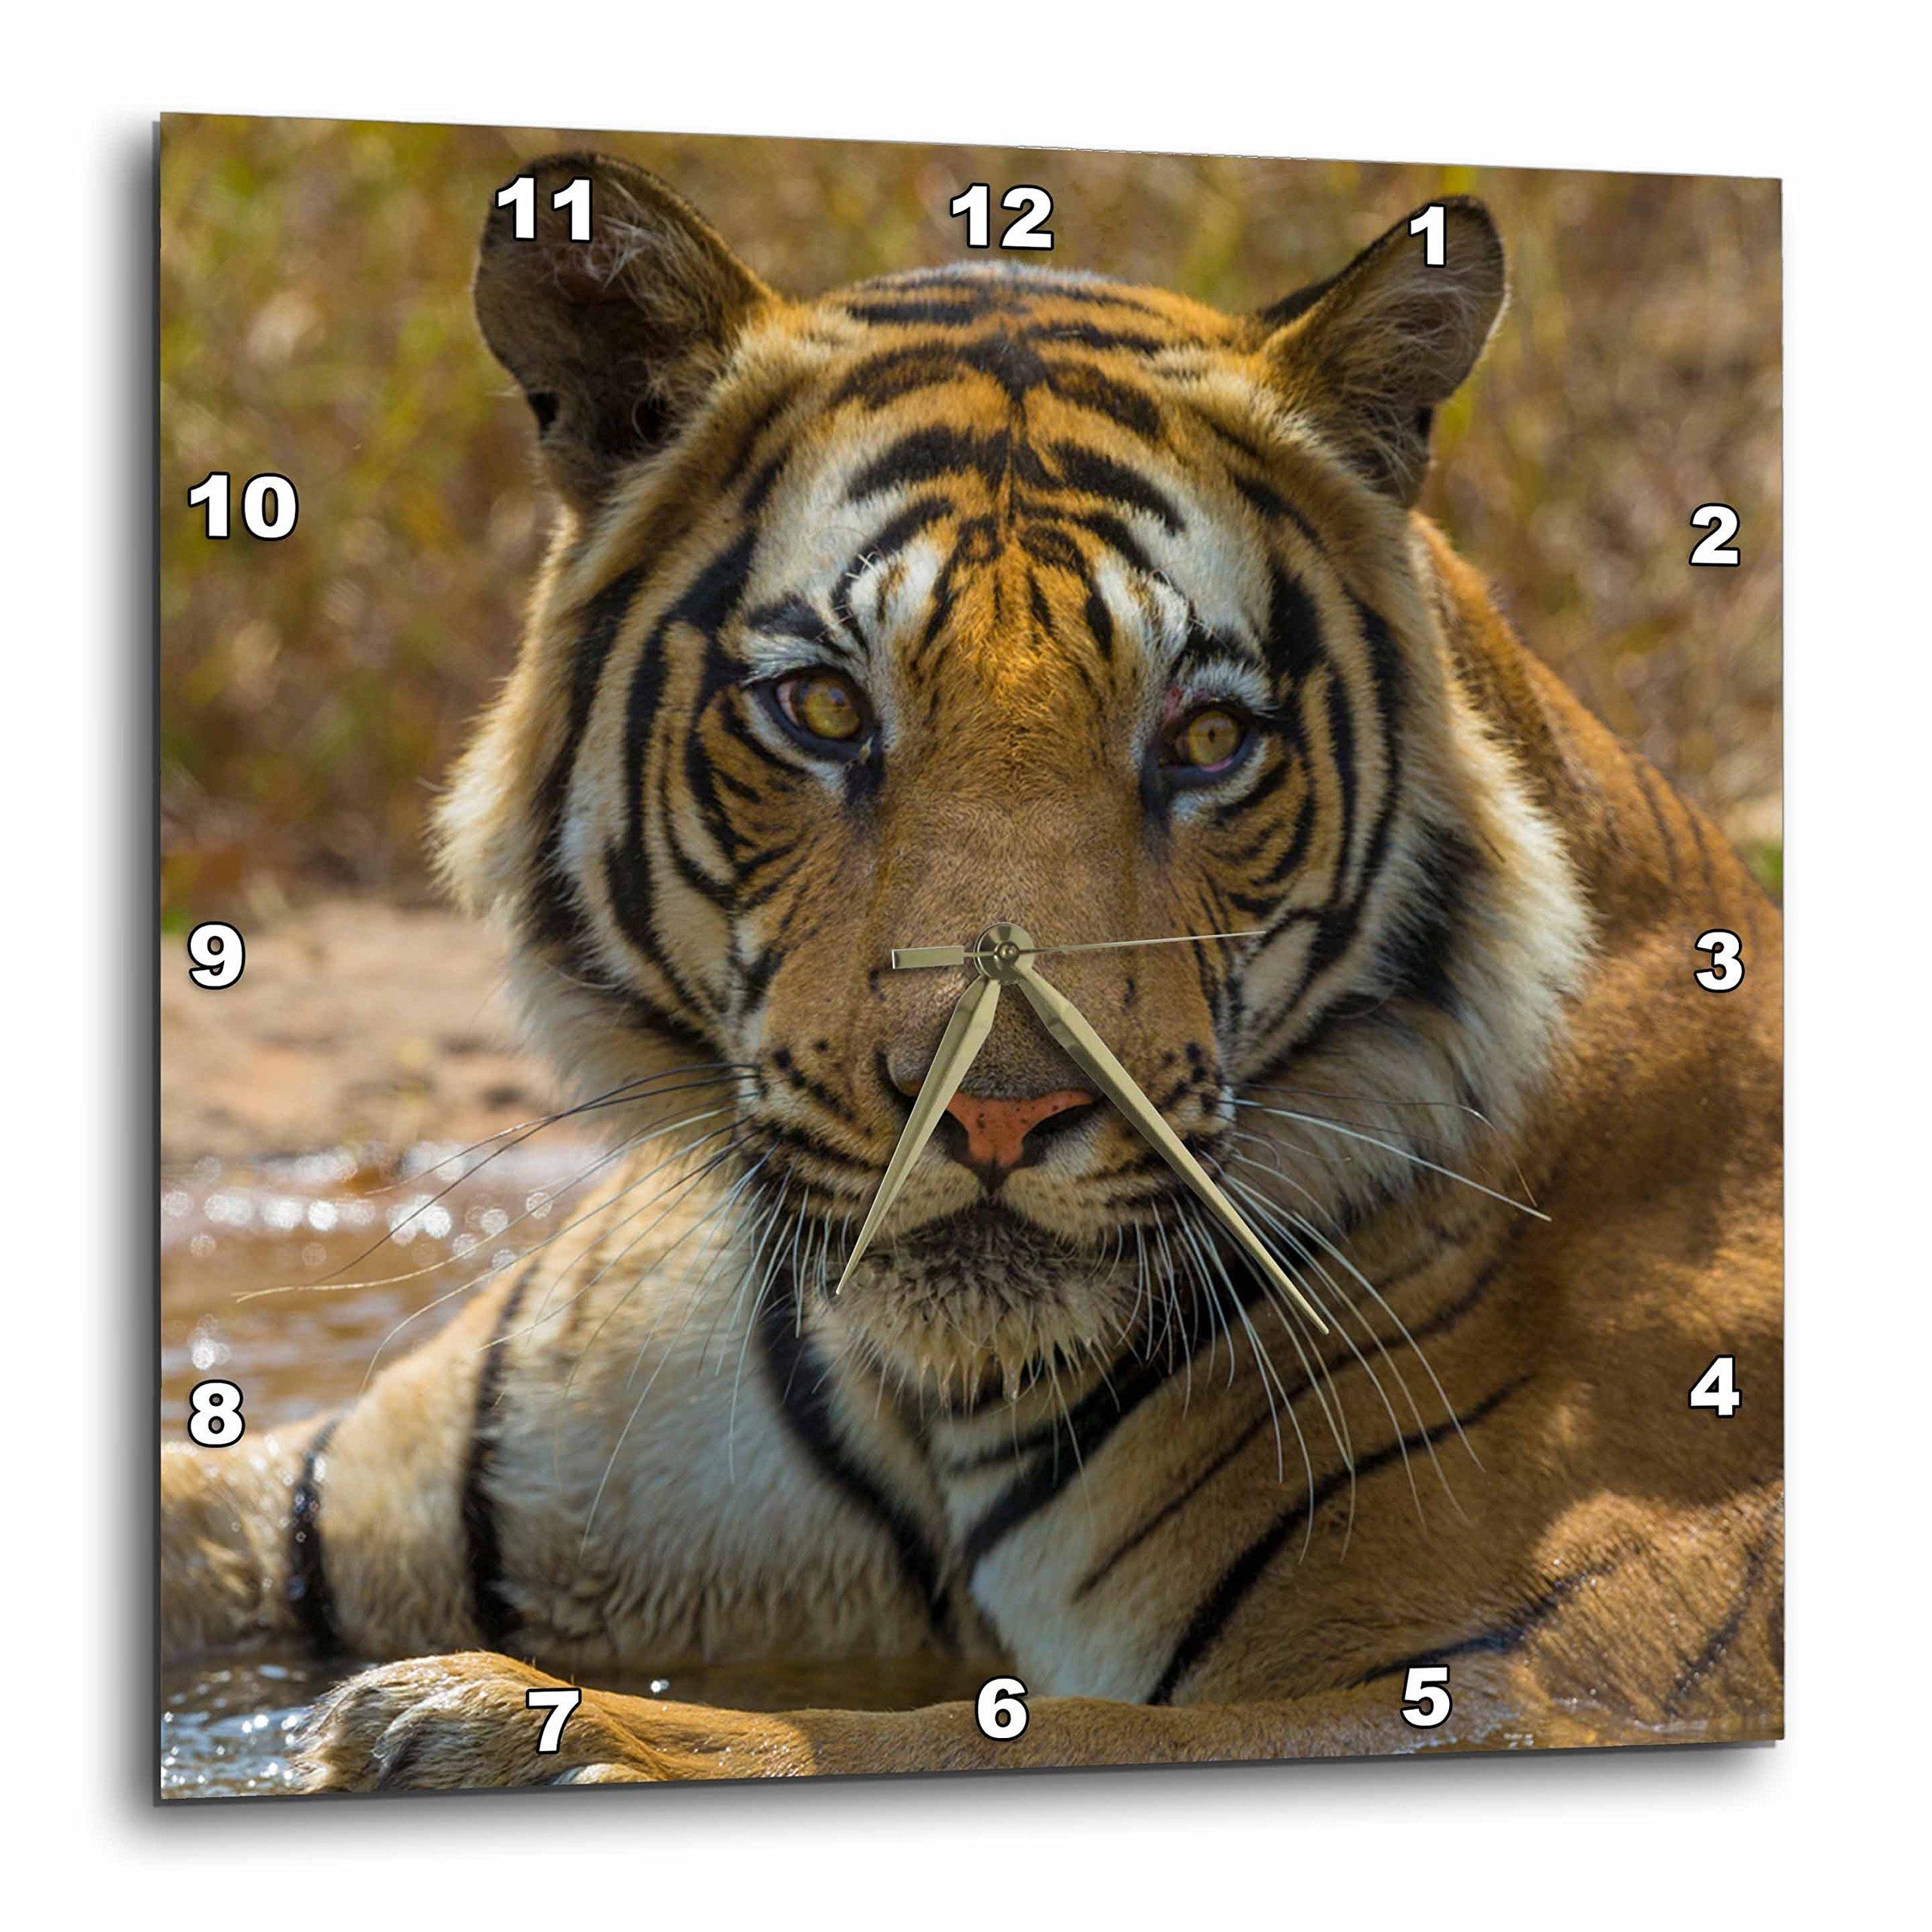 3dRose India Bandhavgarh Reserve, Bengal Tiger Resting in Water Wall Clock, 15'' x 15''